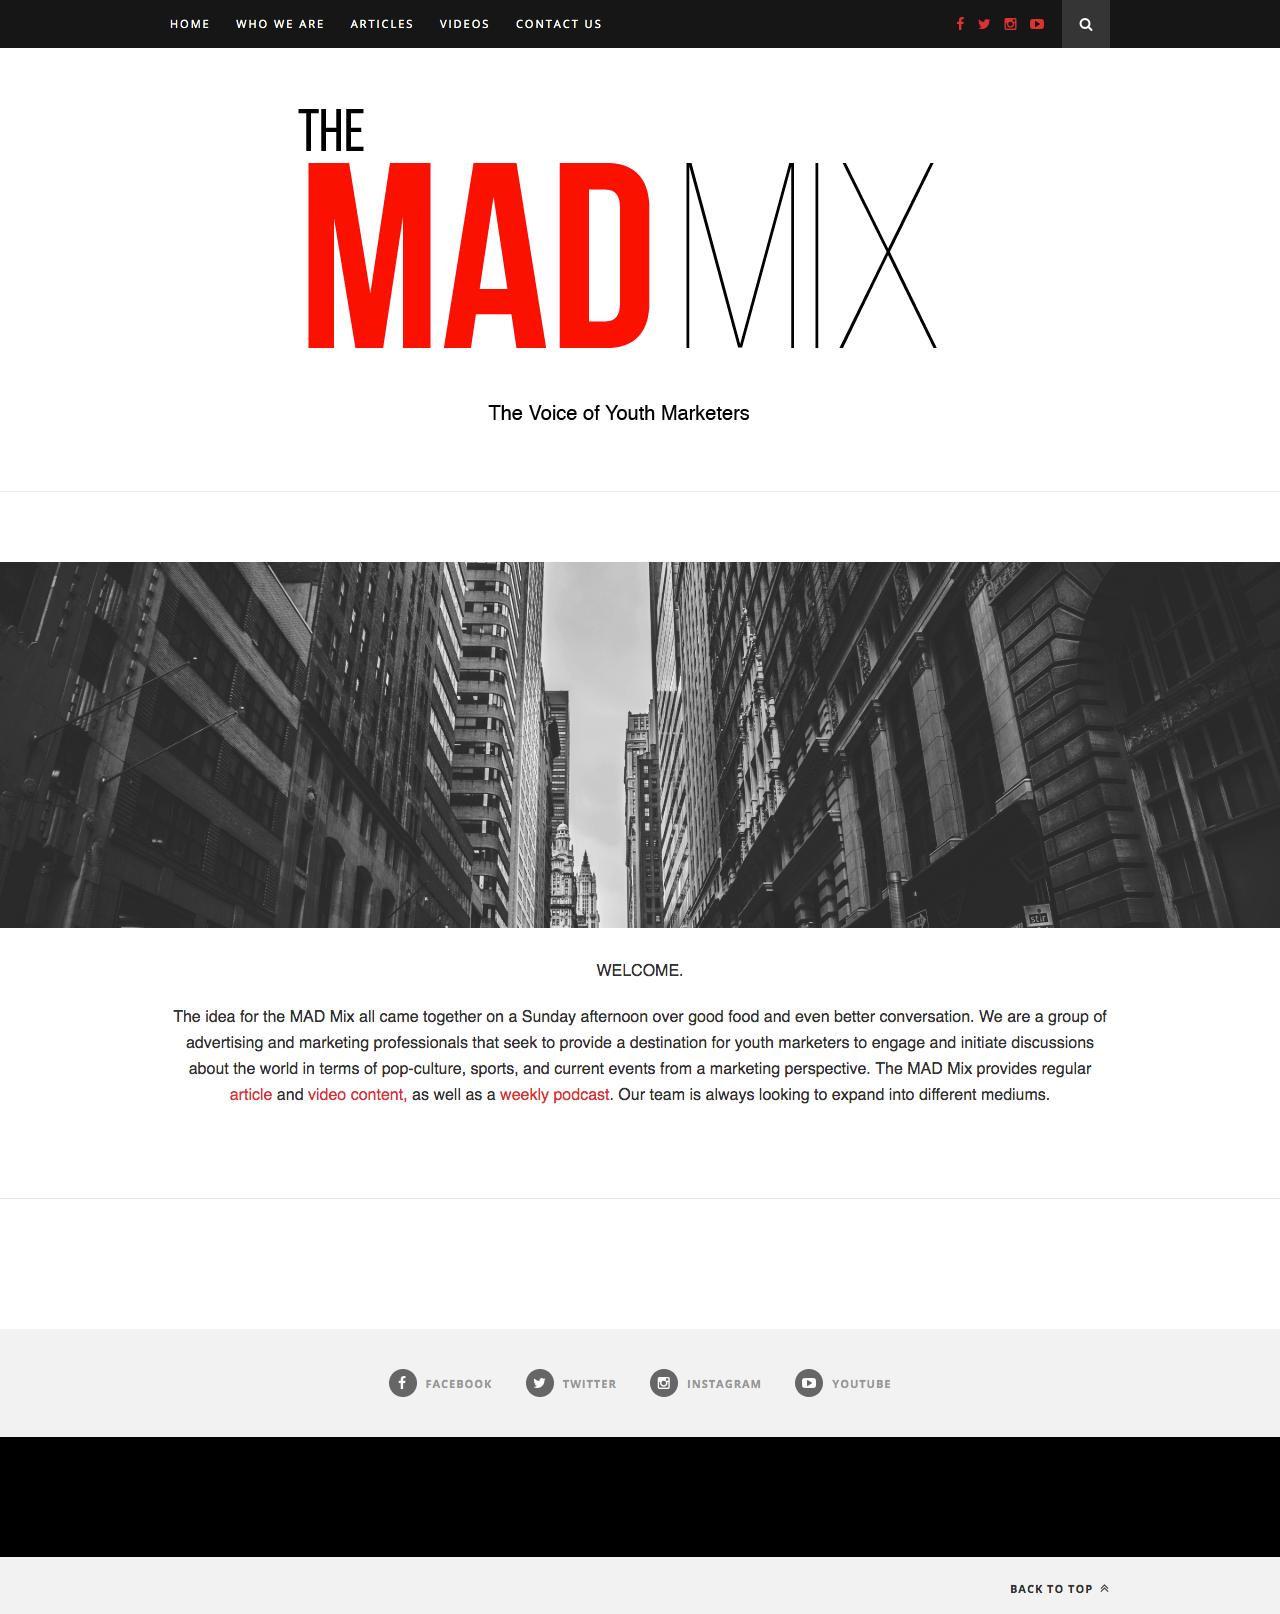 The MAD Mix Homepage Screenshot